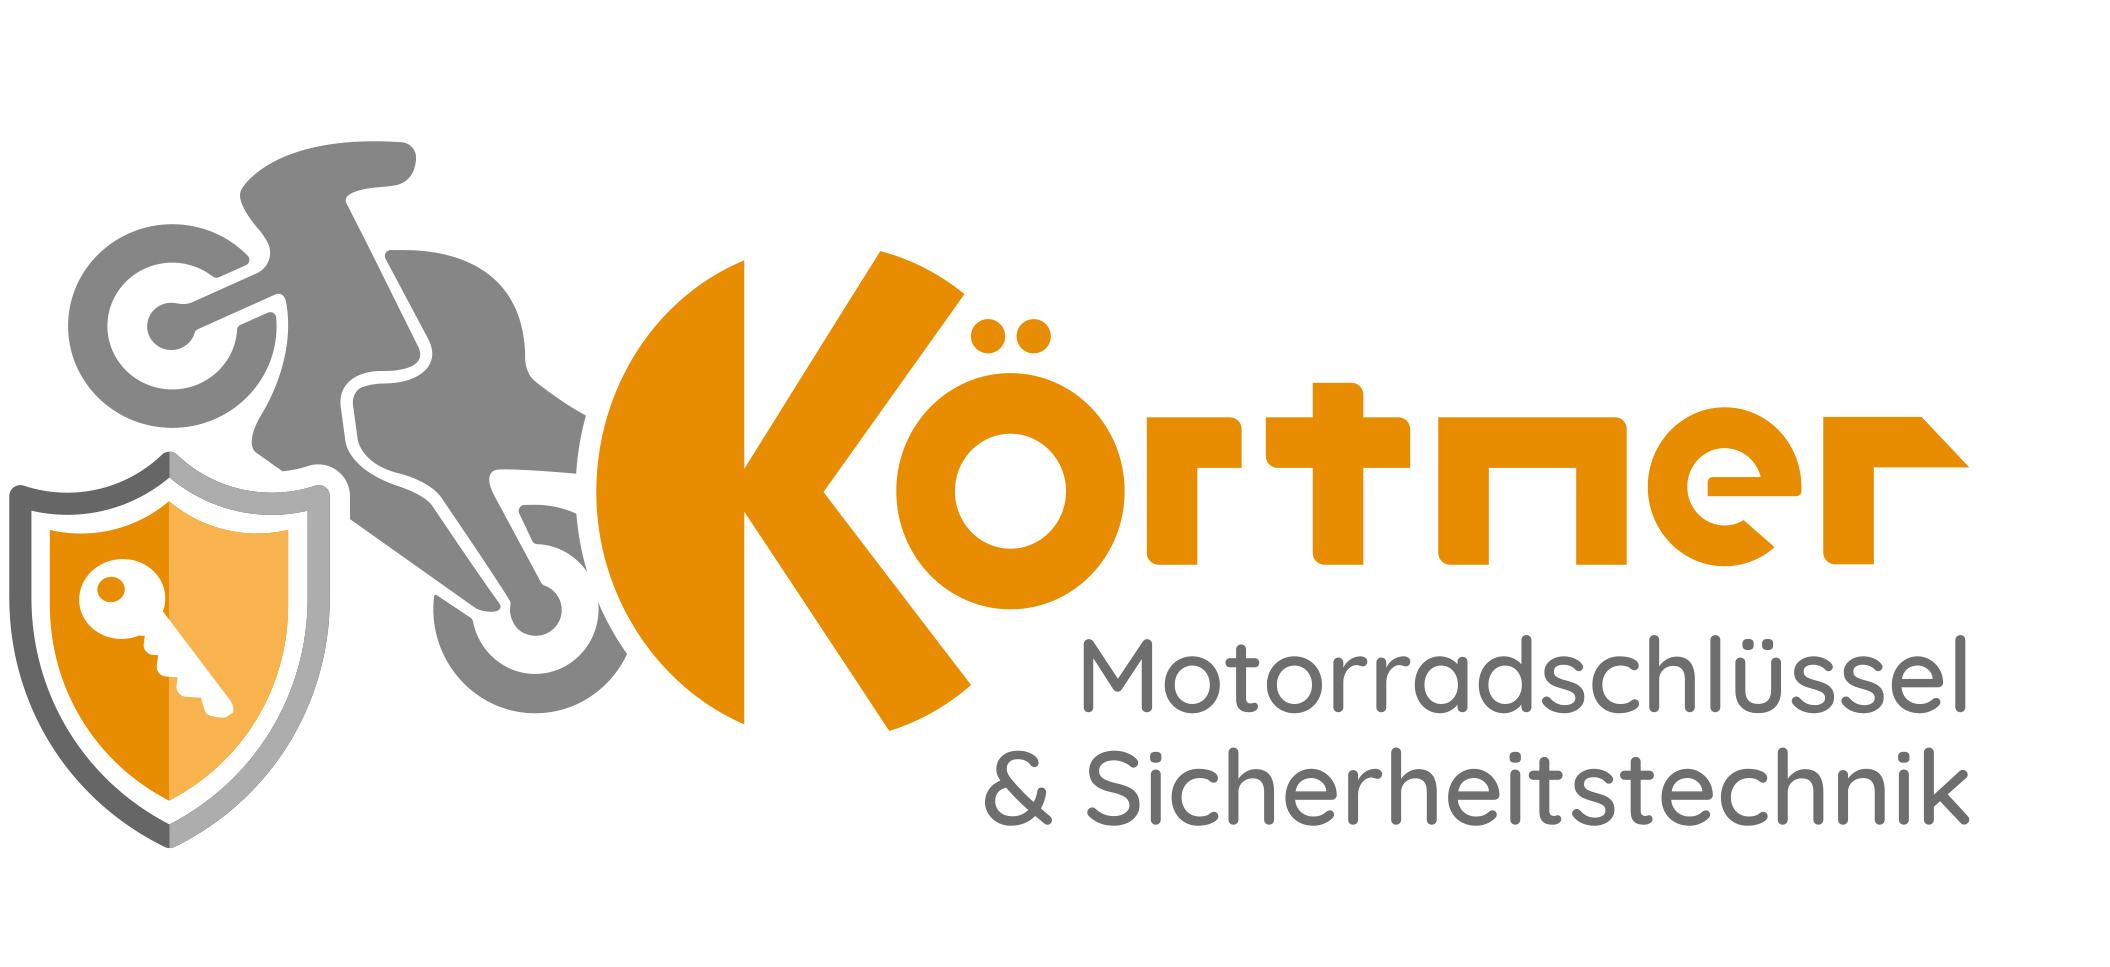 Körtner Motorradschlüssel & Sicherheitstechnik